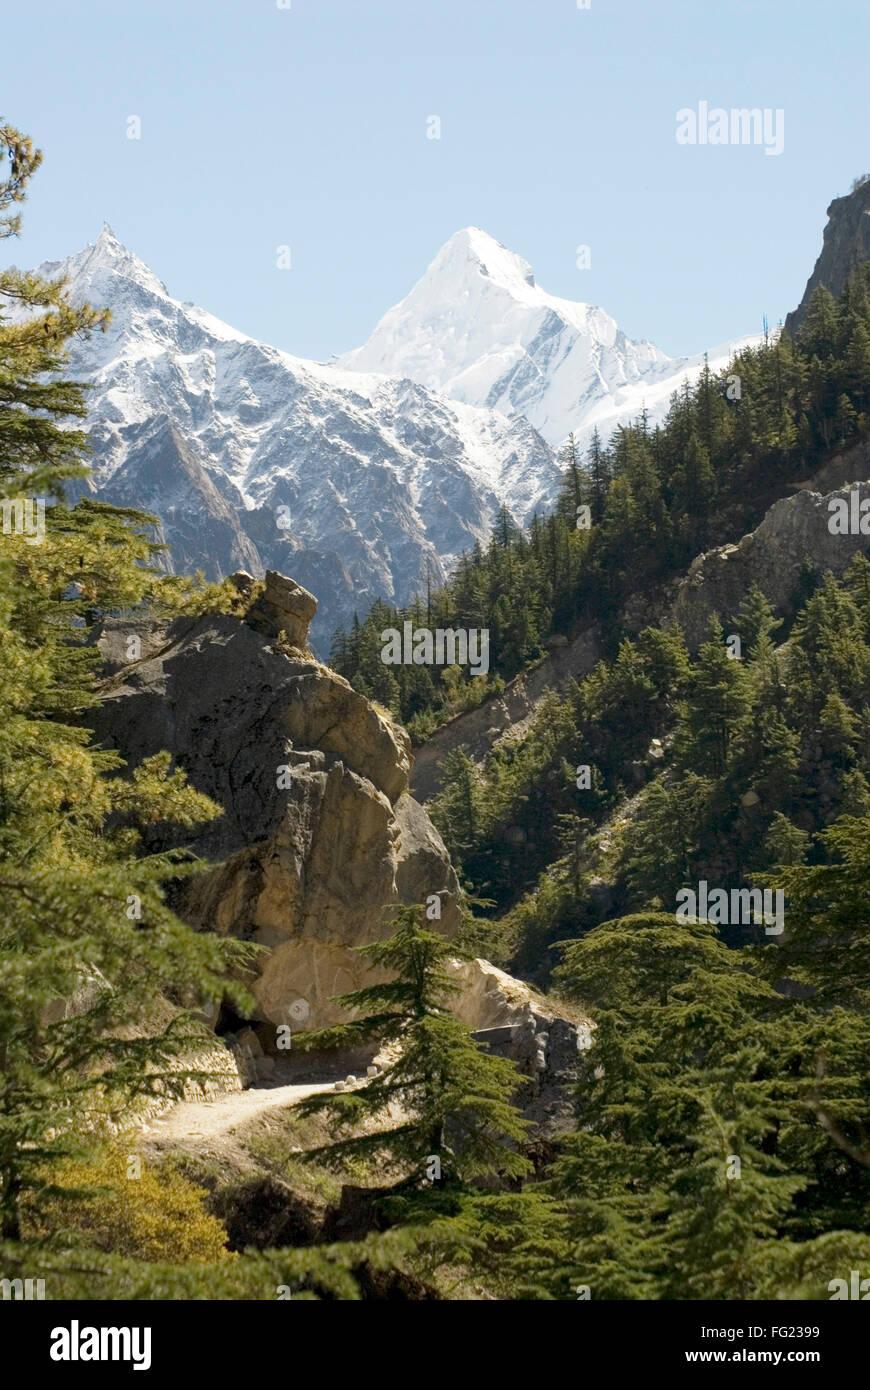 Gangotri national park at Gangotri and Himalayan snow on mountain peak of Sudarshan , Uttaranchal , India - Stock Image